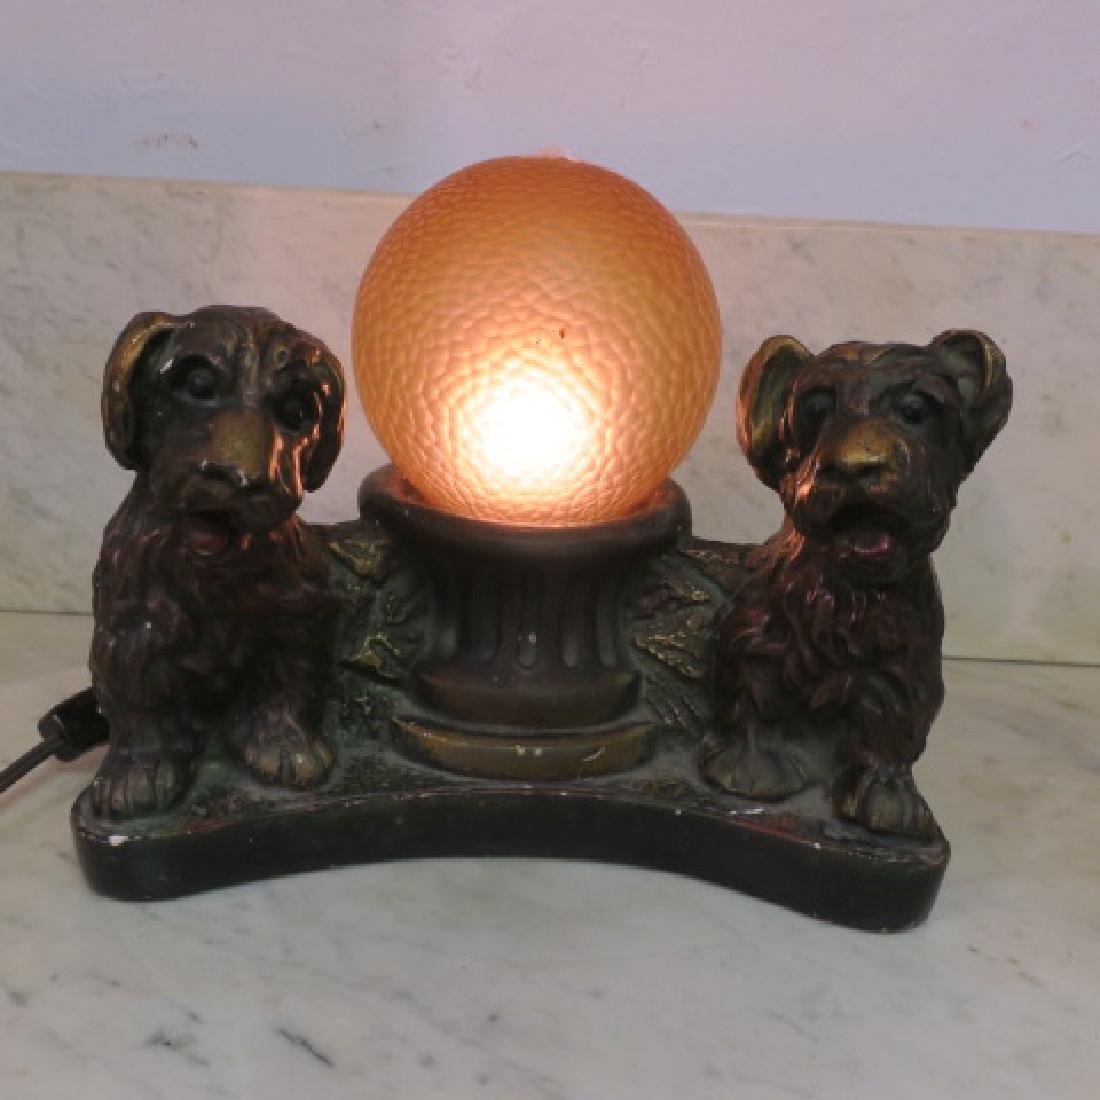 IAS COMPANY Deco Radio Chalkware Lamp: - 4